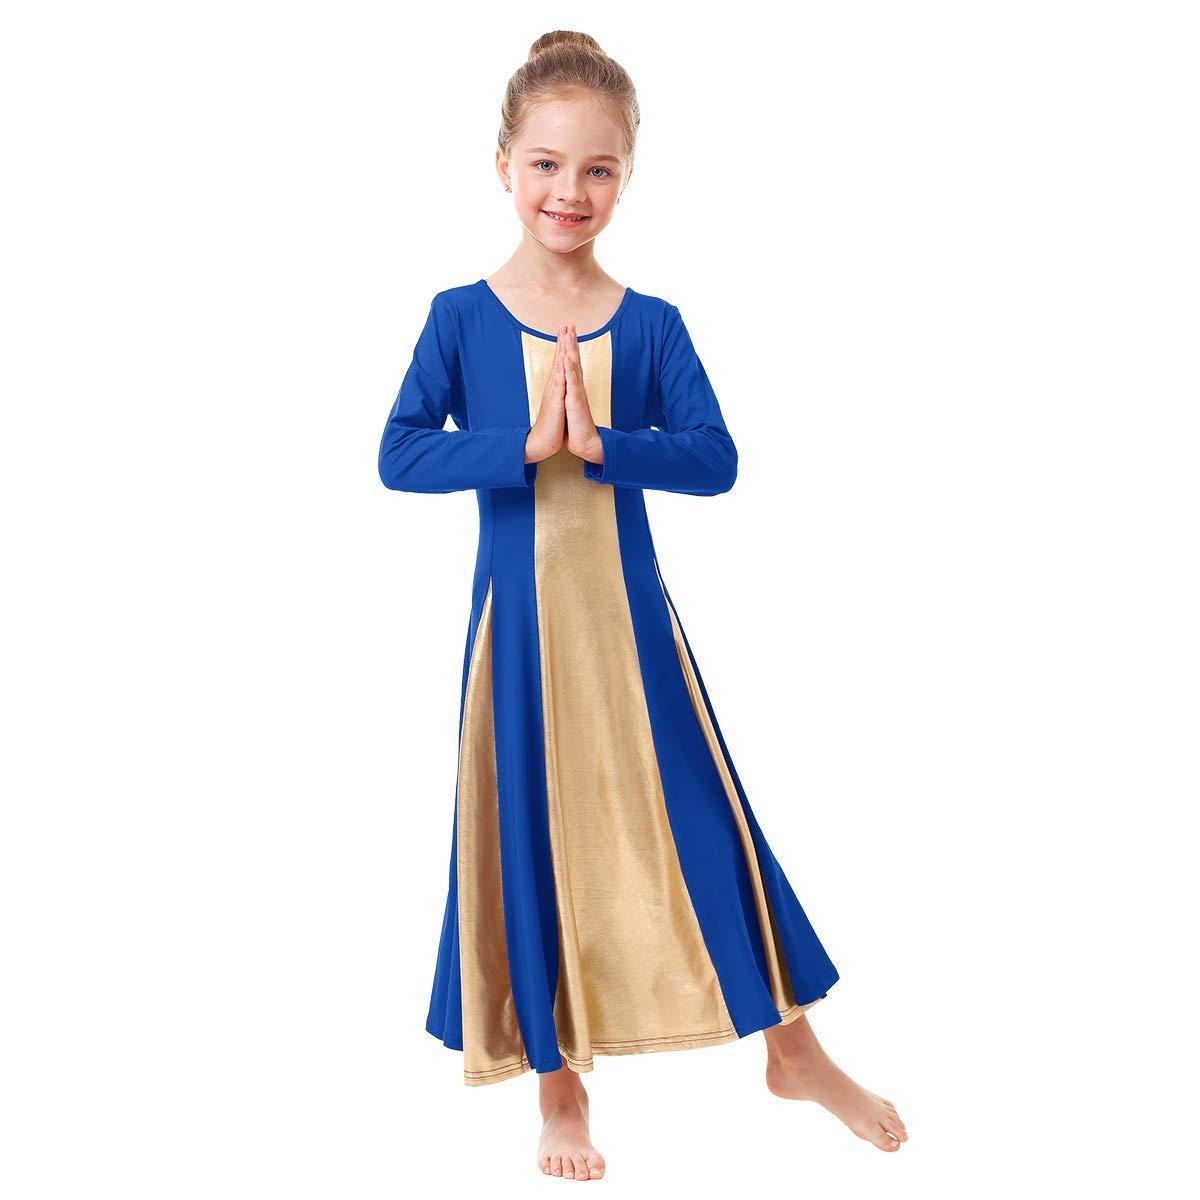 IBAKOM Little/Big Girls Metallic Gold Liturgical Praise Dance Dress Loose Fit Full Length Worship Tunic Circle Costume